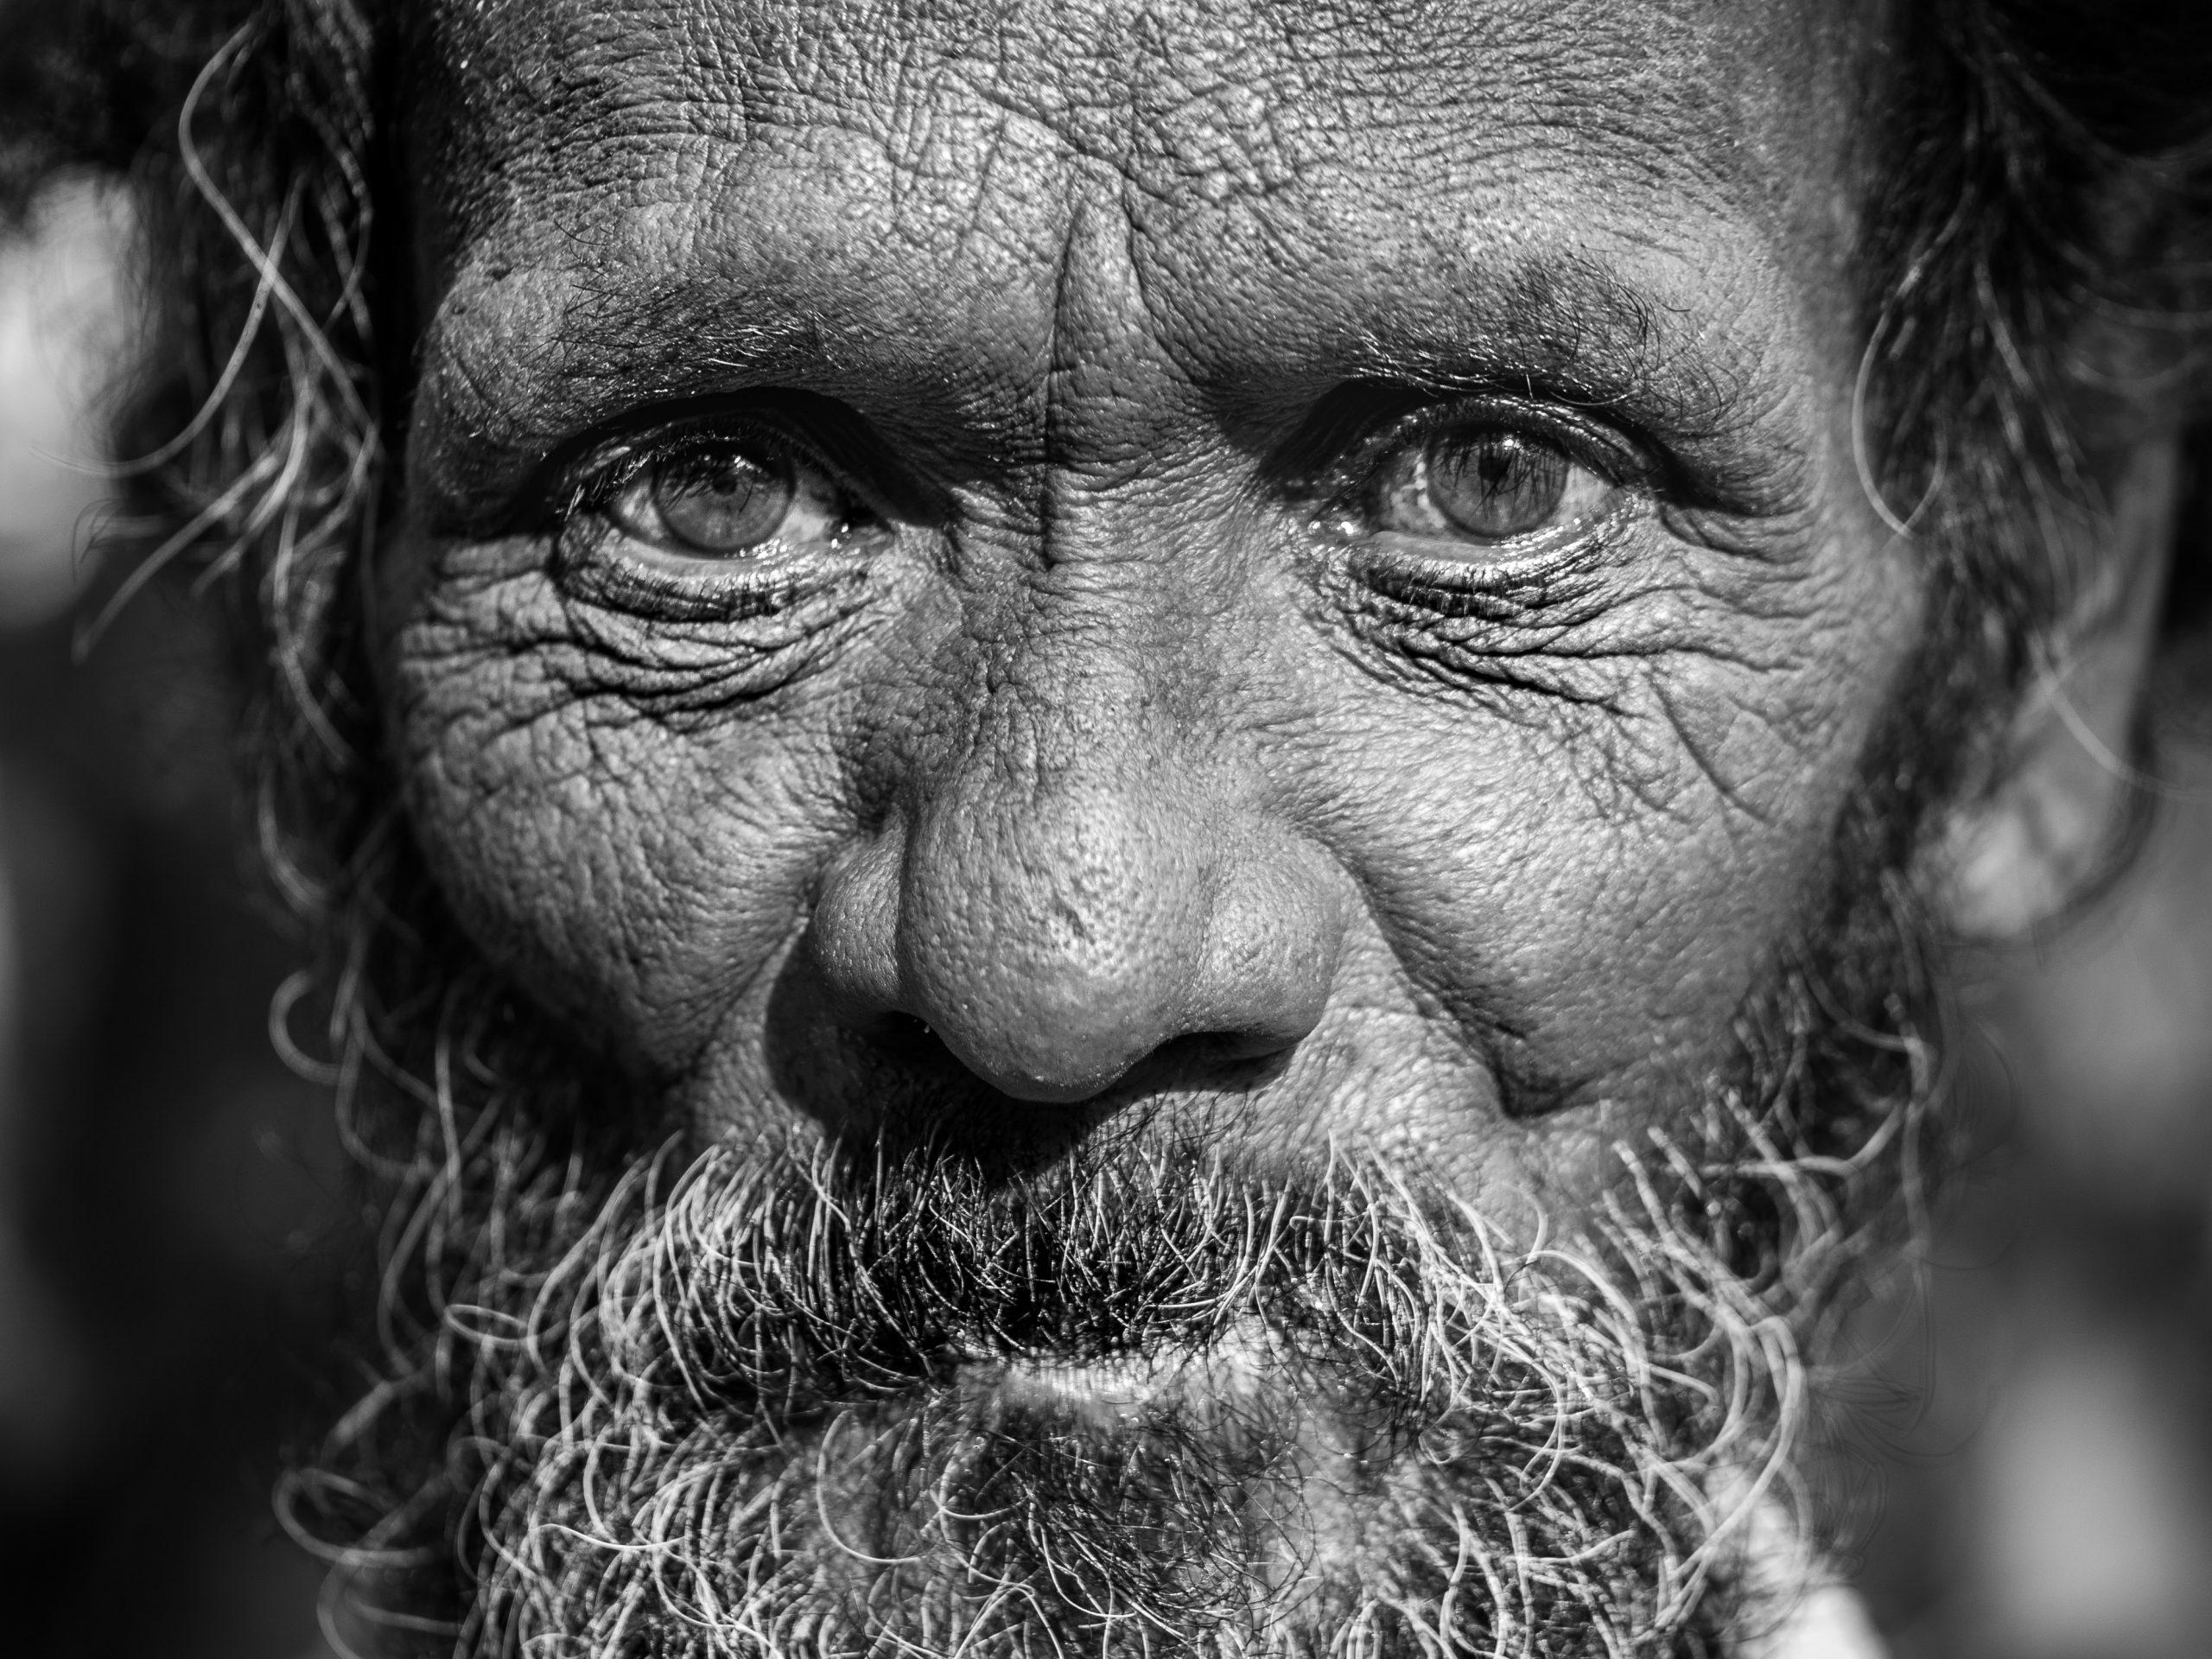 Photo by Madhav Rajesh on Unsplash